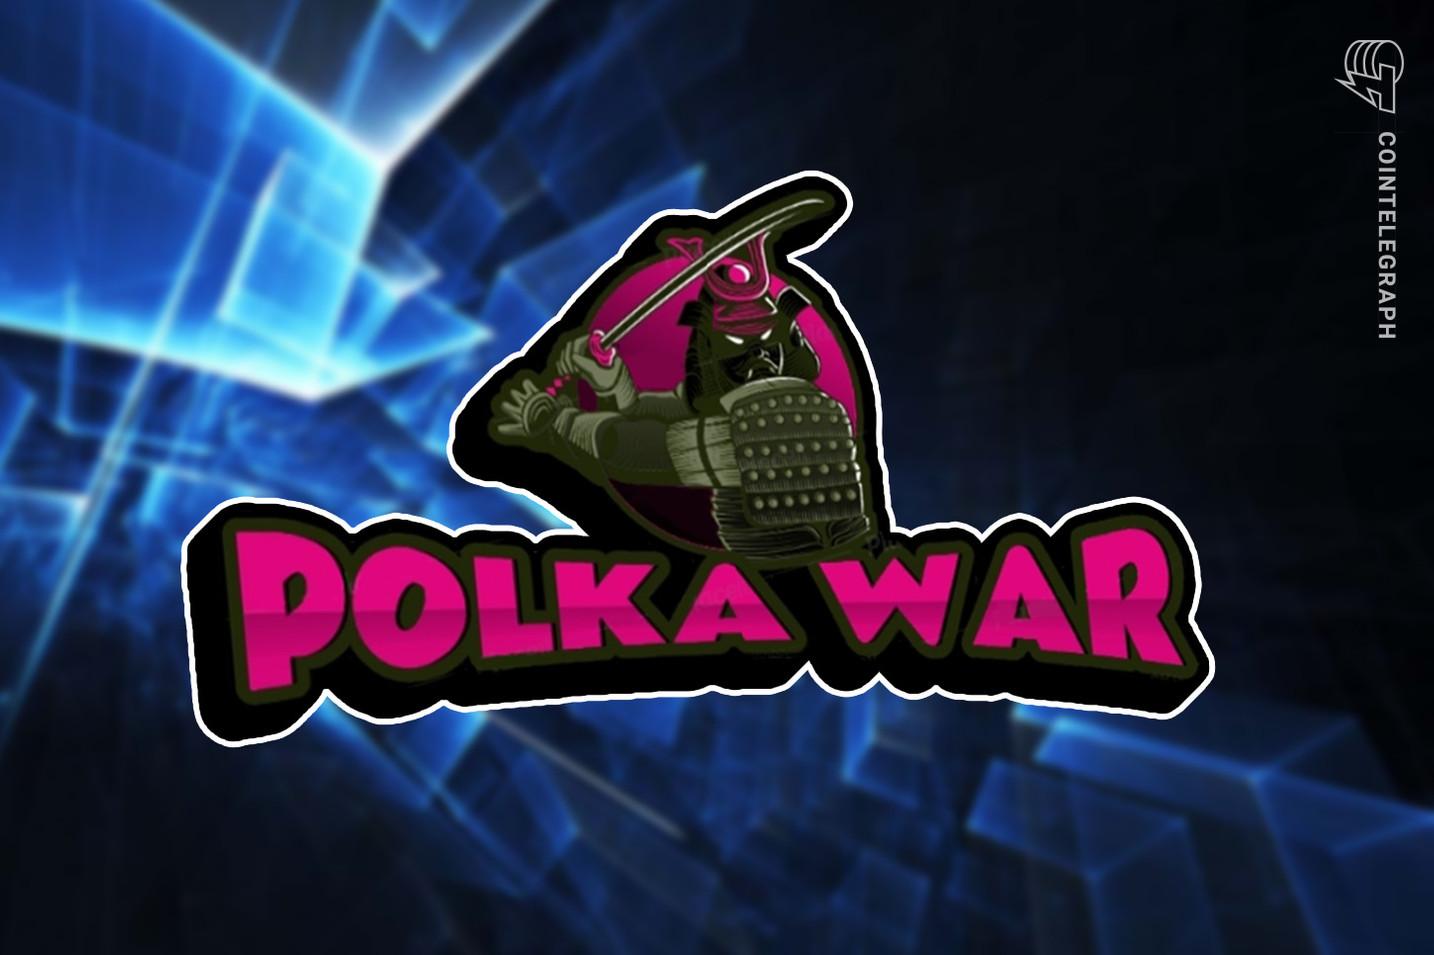 PolkaWar, an innovative DeFi and NFT gaming platform, raises $1.4M